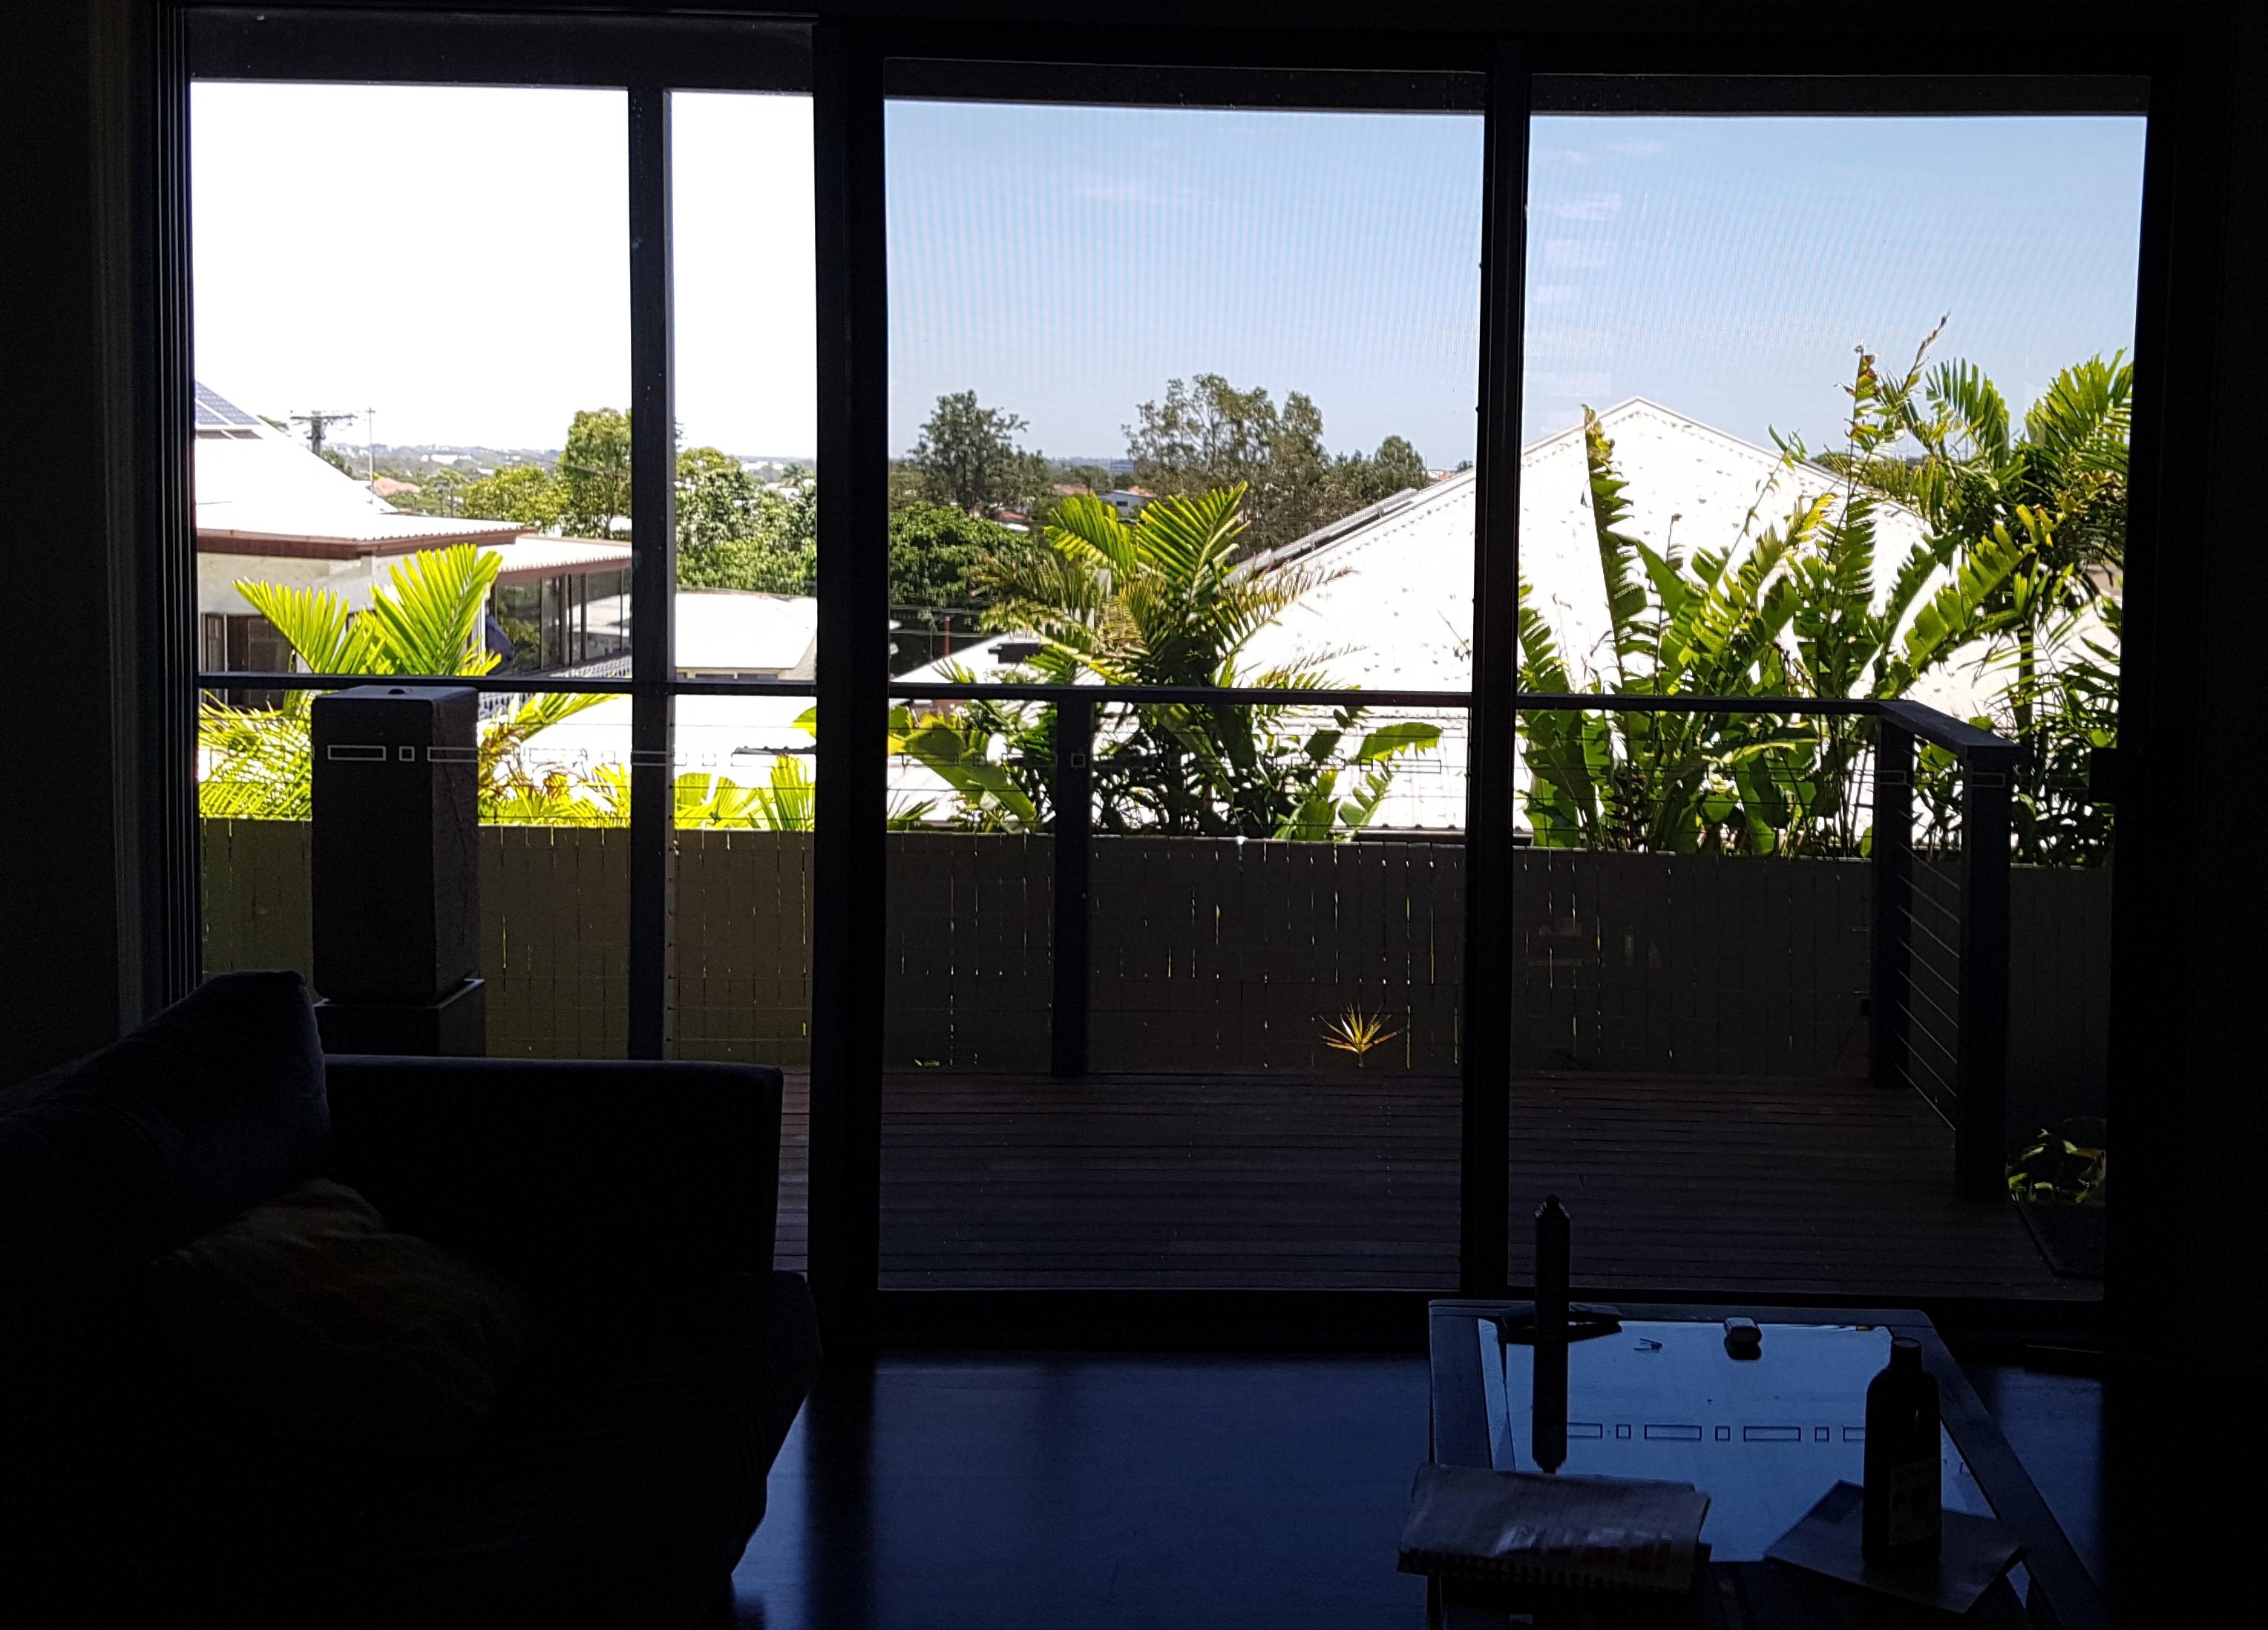 Brisbane - clear blue skies and breezes